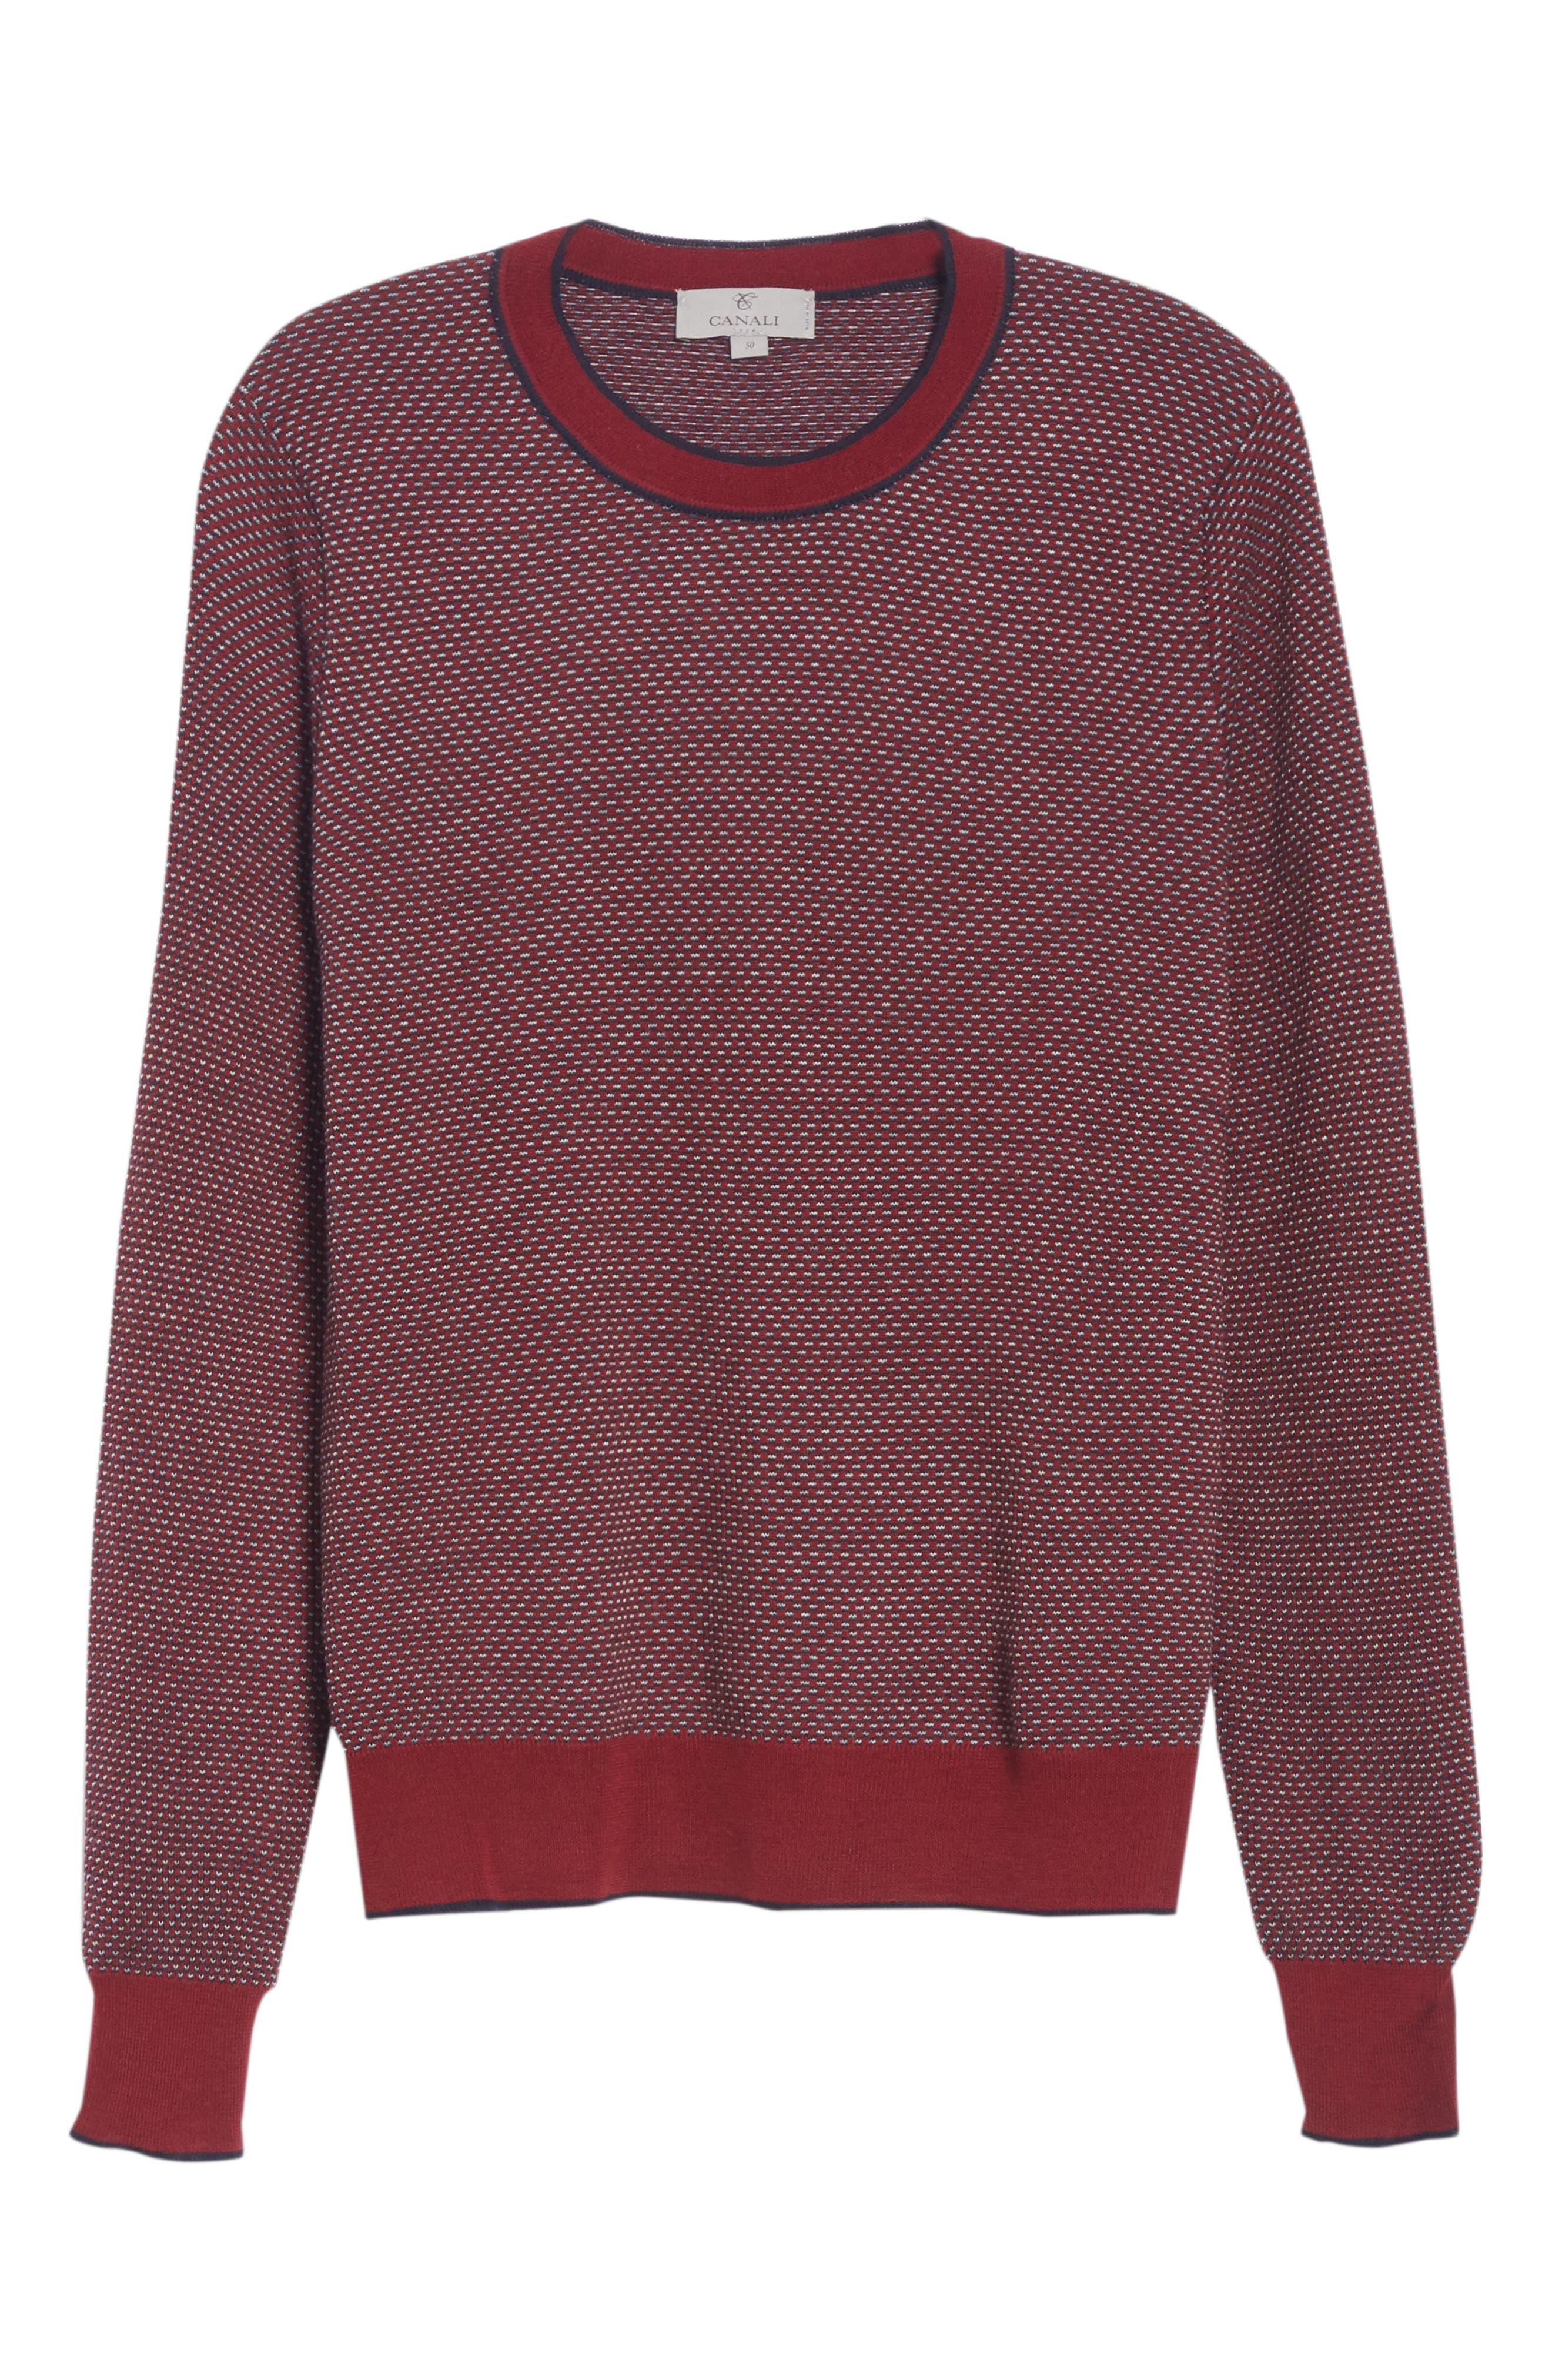 Crewneck Wool Sweater,                             Alternate thumbnail 6, color,                             600